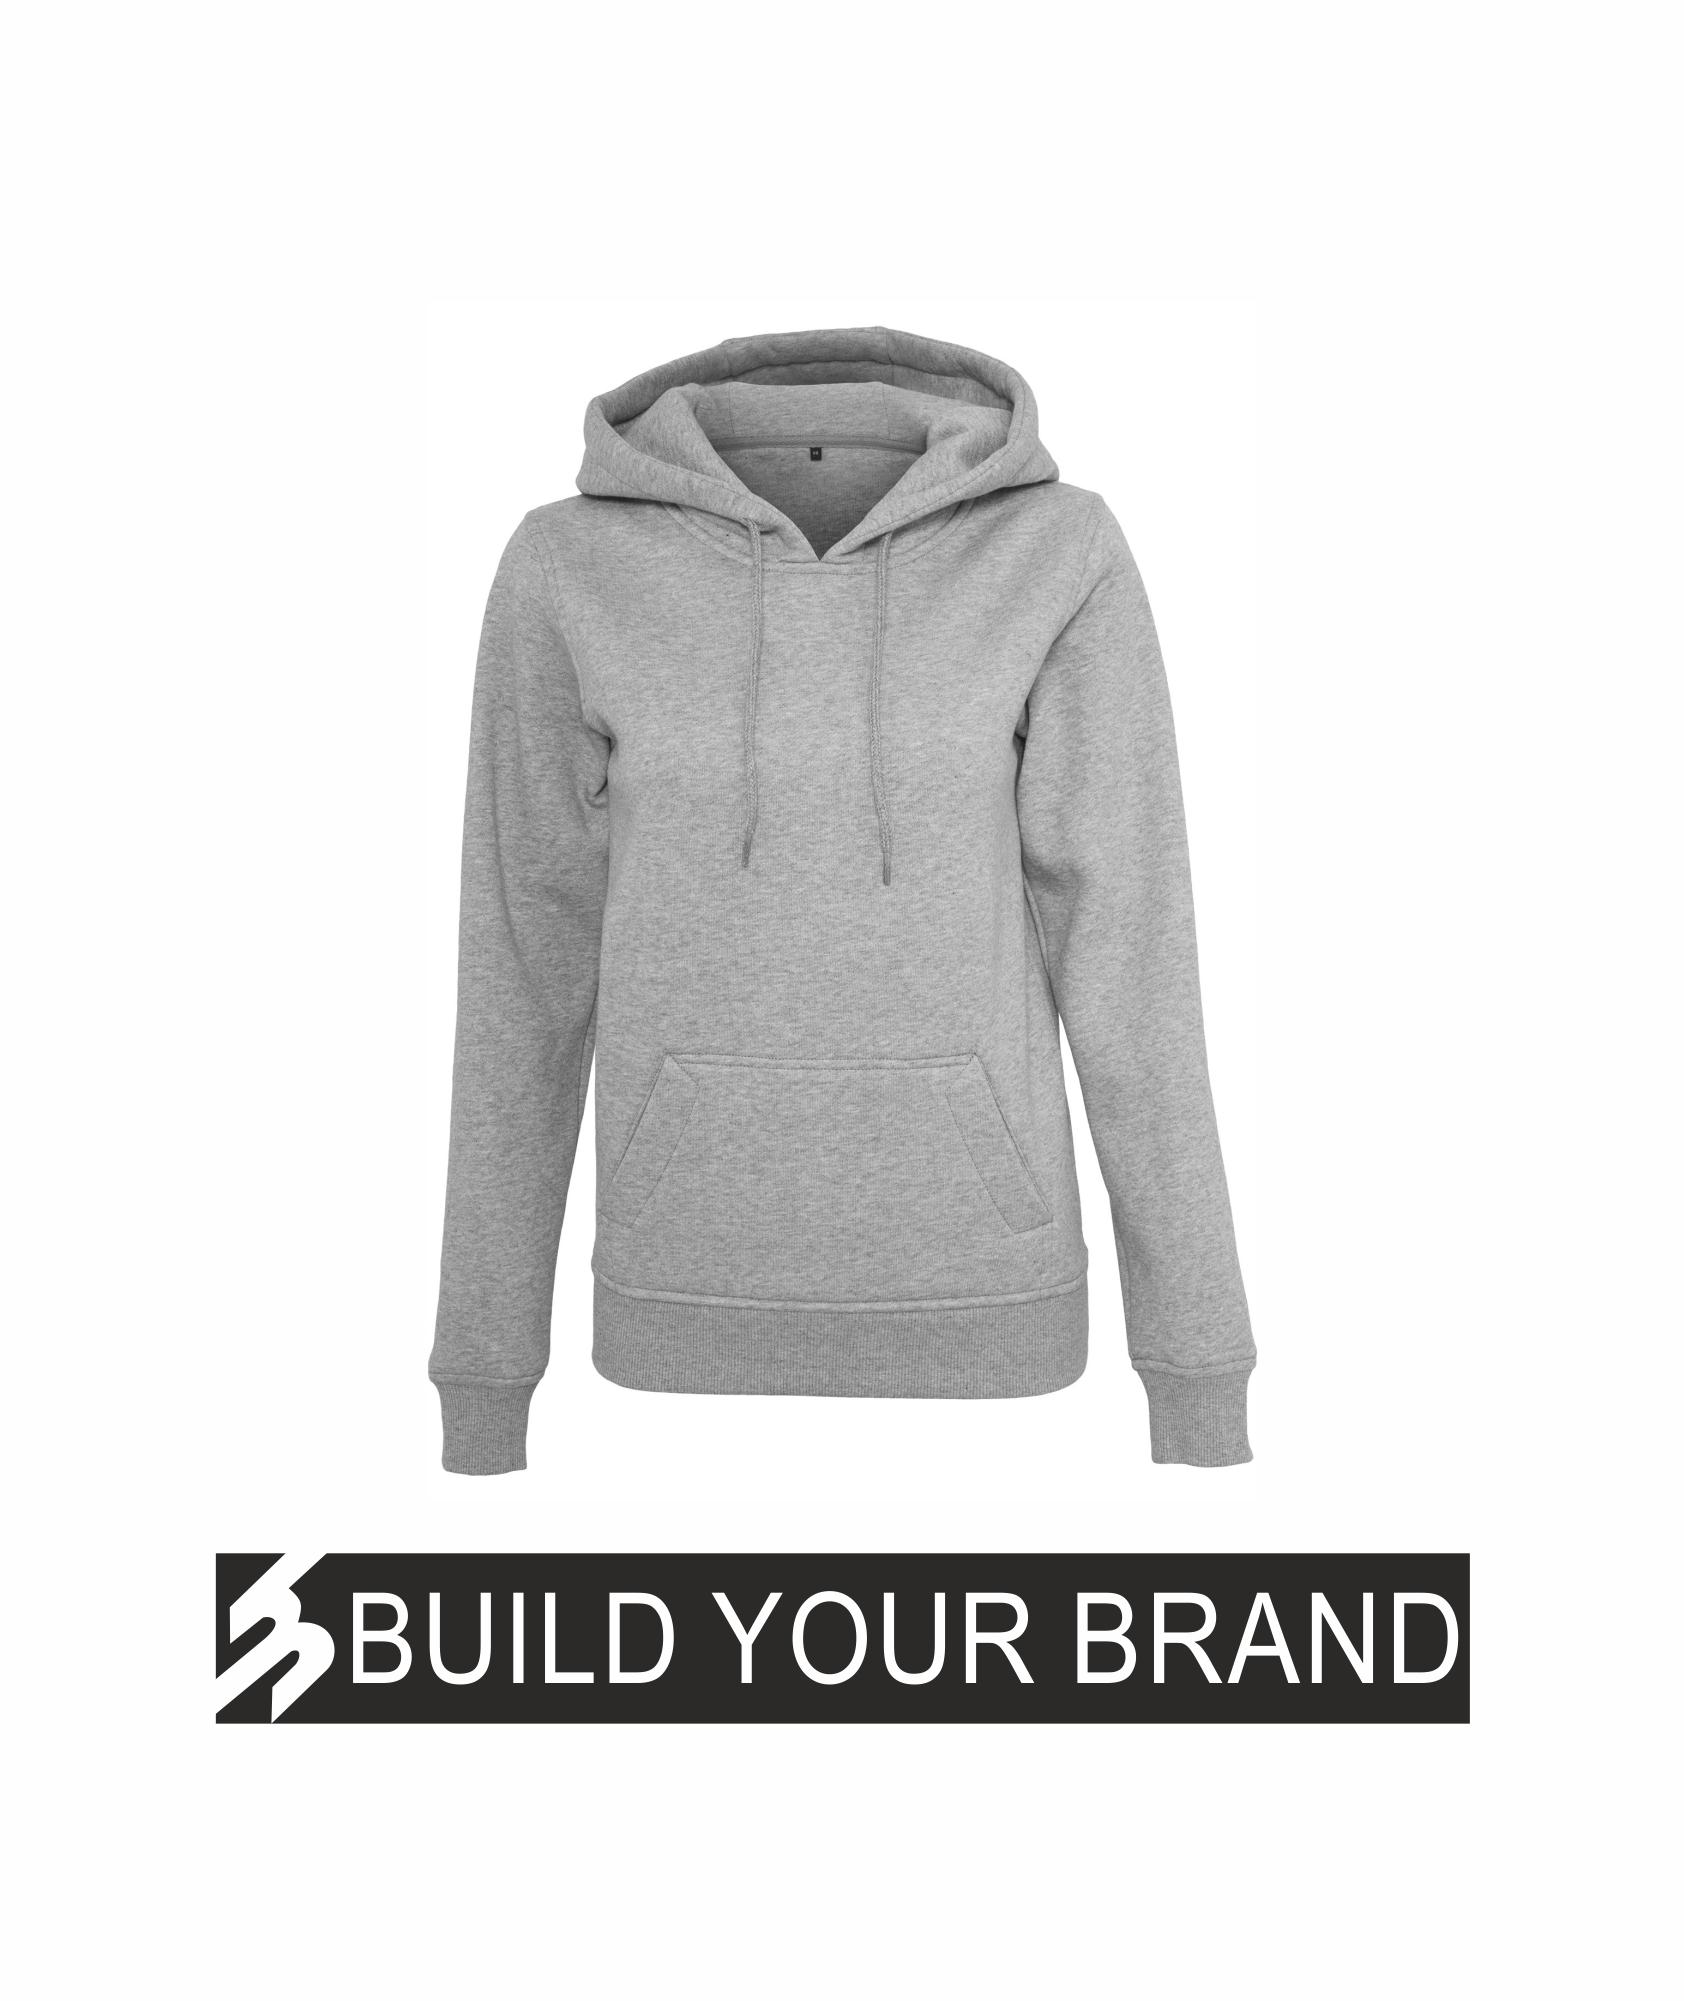 Build your Brand Womens Heavy Hoody